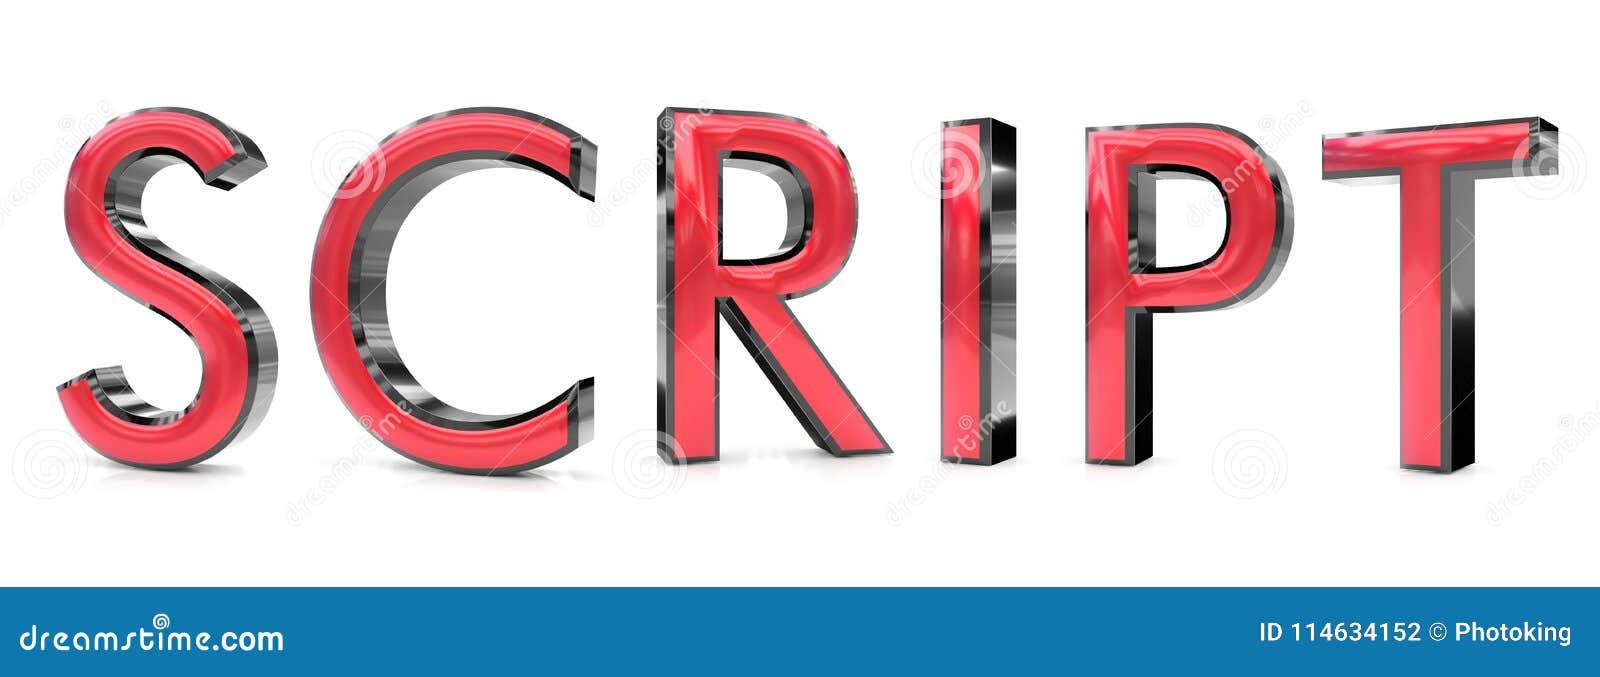 script 3d word stock illustration illustration of background